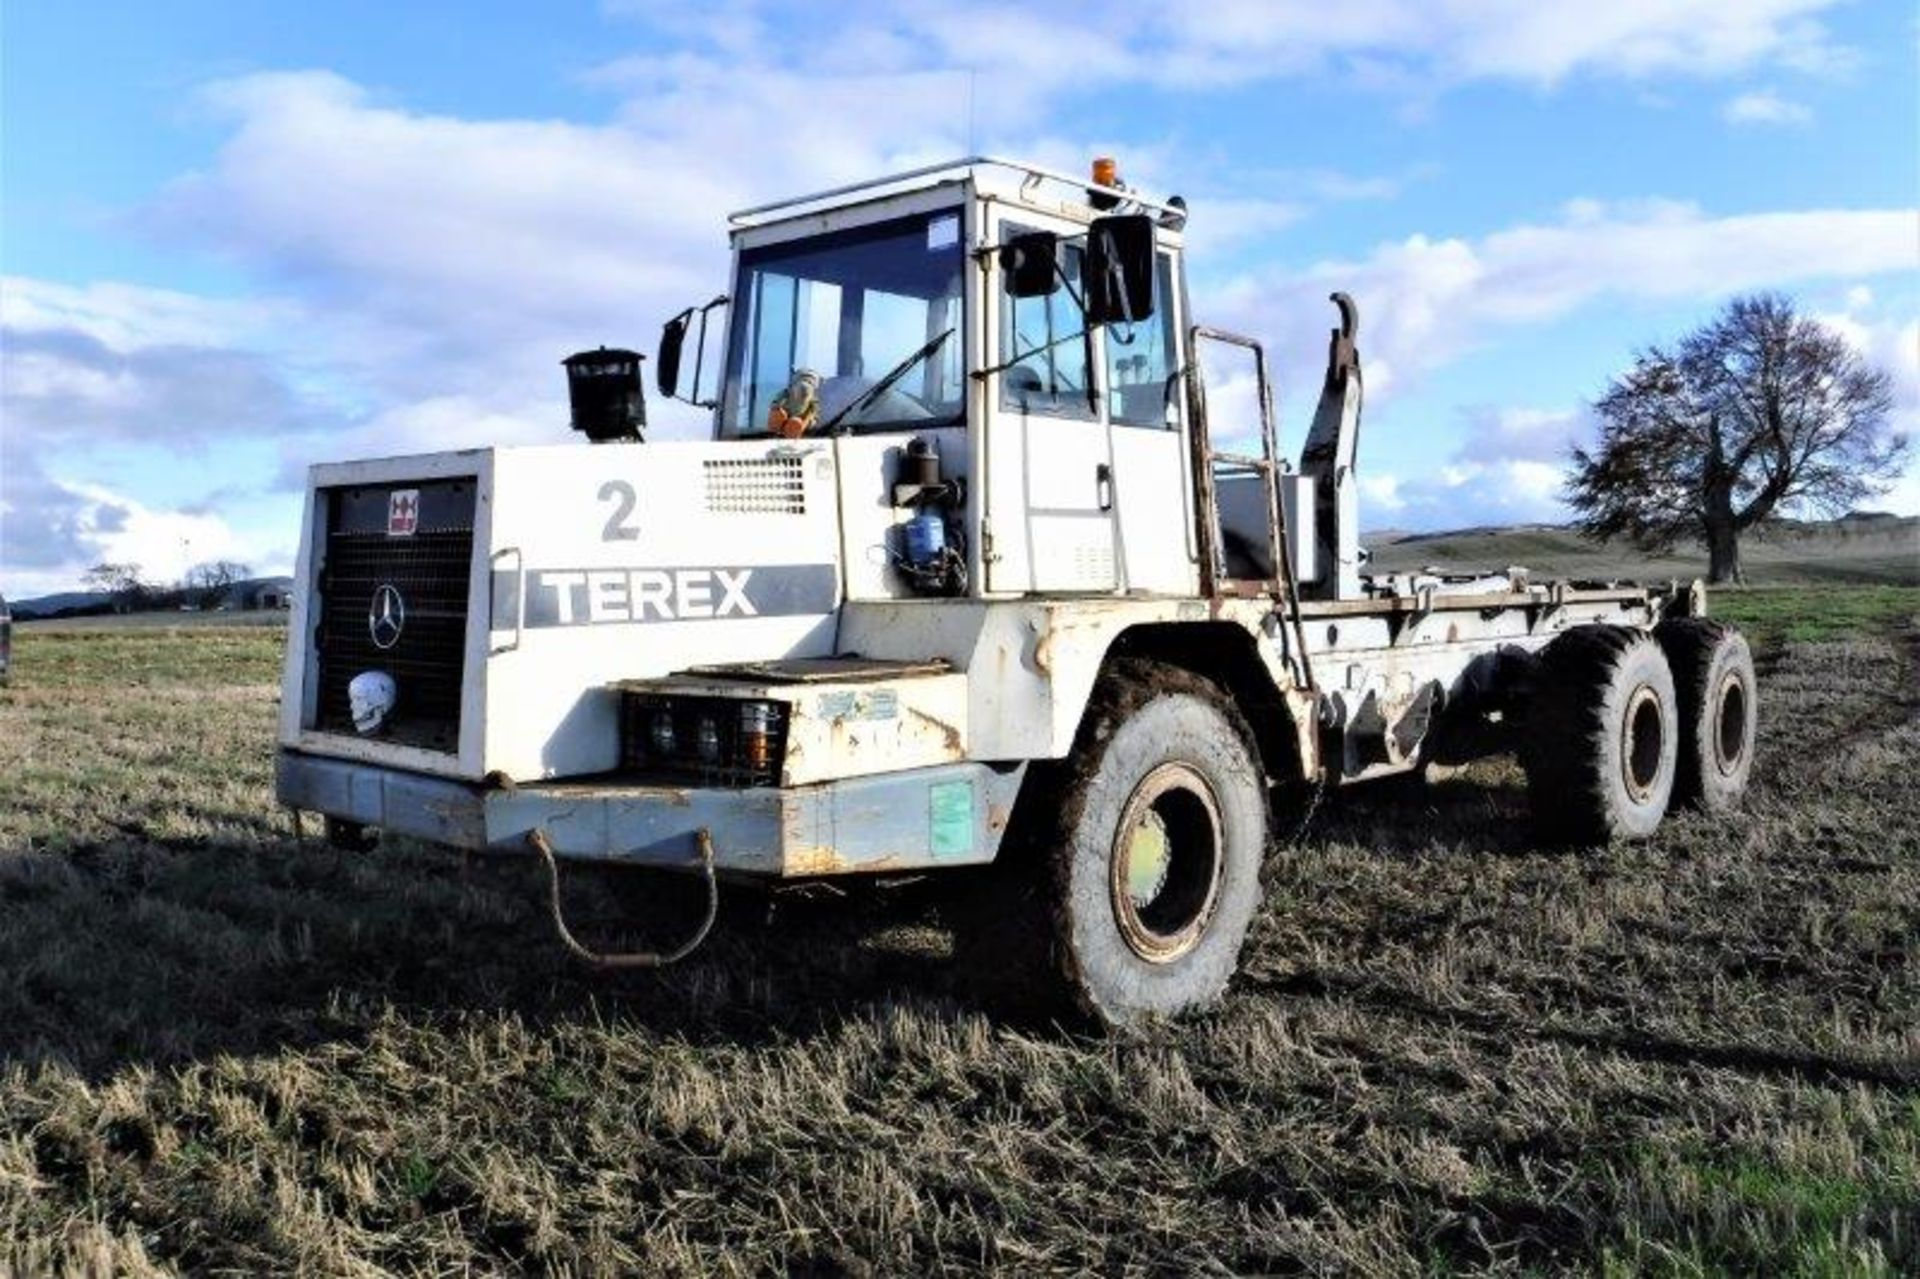 Auktionslos 838 - 1999 TEREX TA25 6x4 big hook s/n 7961012